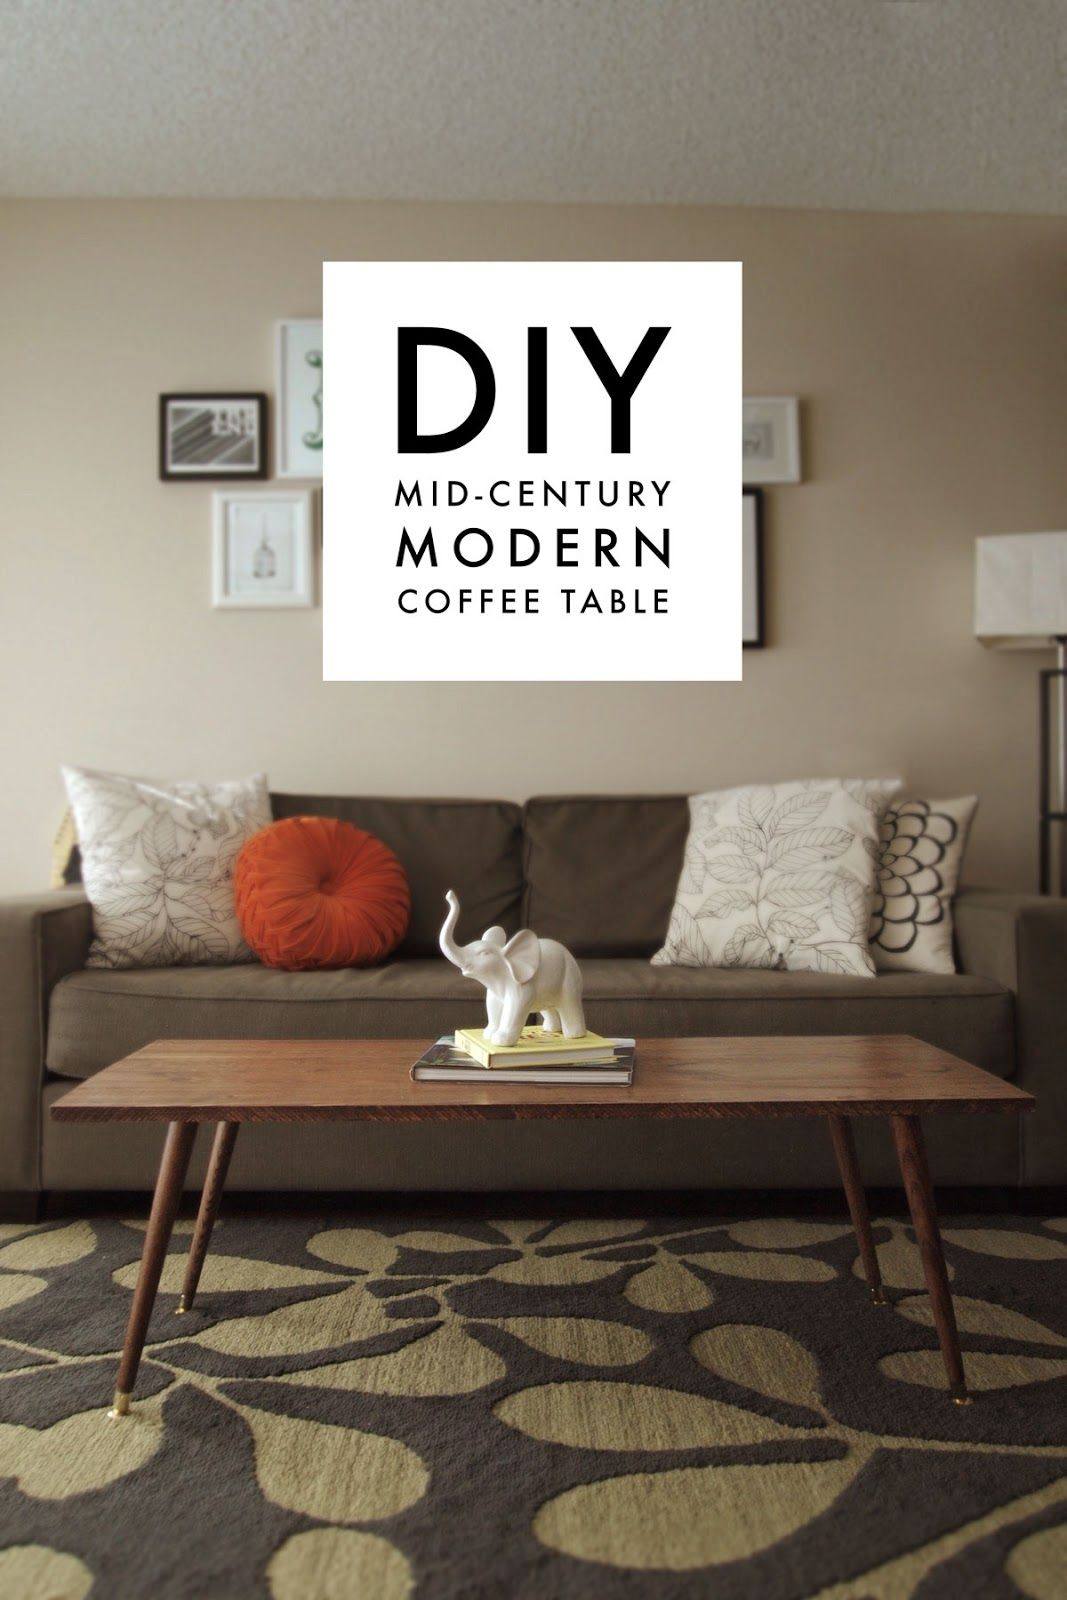 Diy Mid Century Modern Coffee Table Jamie Bartlett Design Mid Century Modern Coffee Table Decor Home Decor